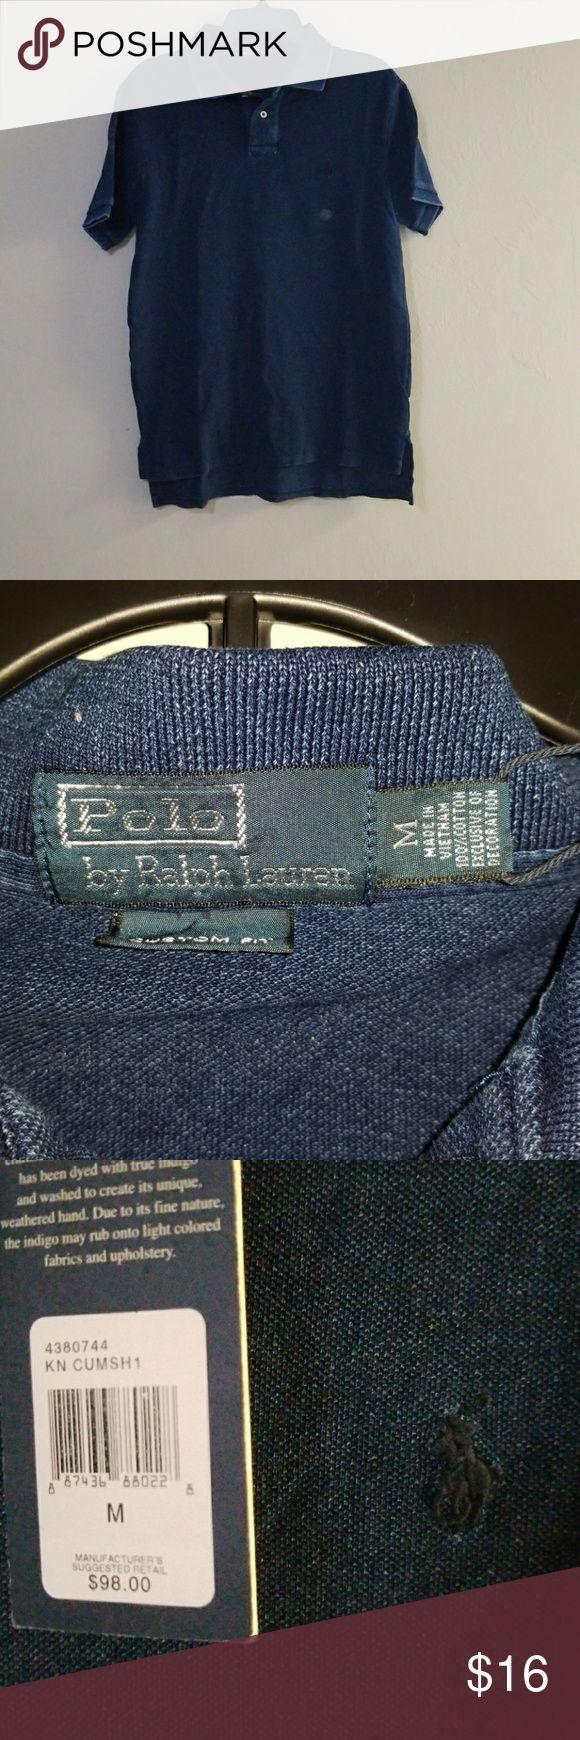 Men's Polo Ralph Lauren Polo shirt BNWT denim color Polo by Ralph Lauren Shirts Polos